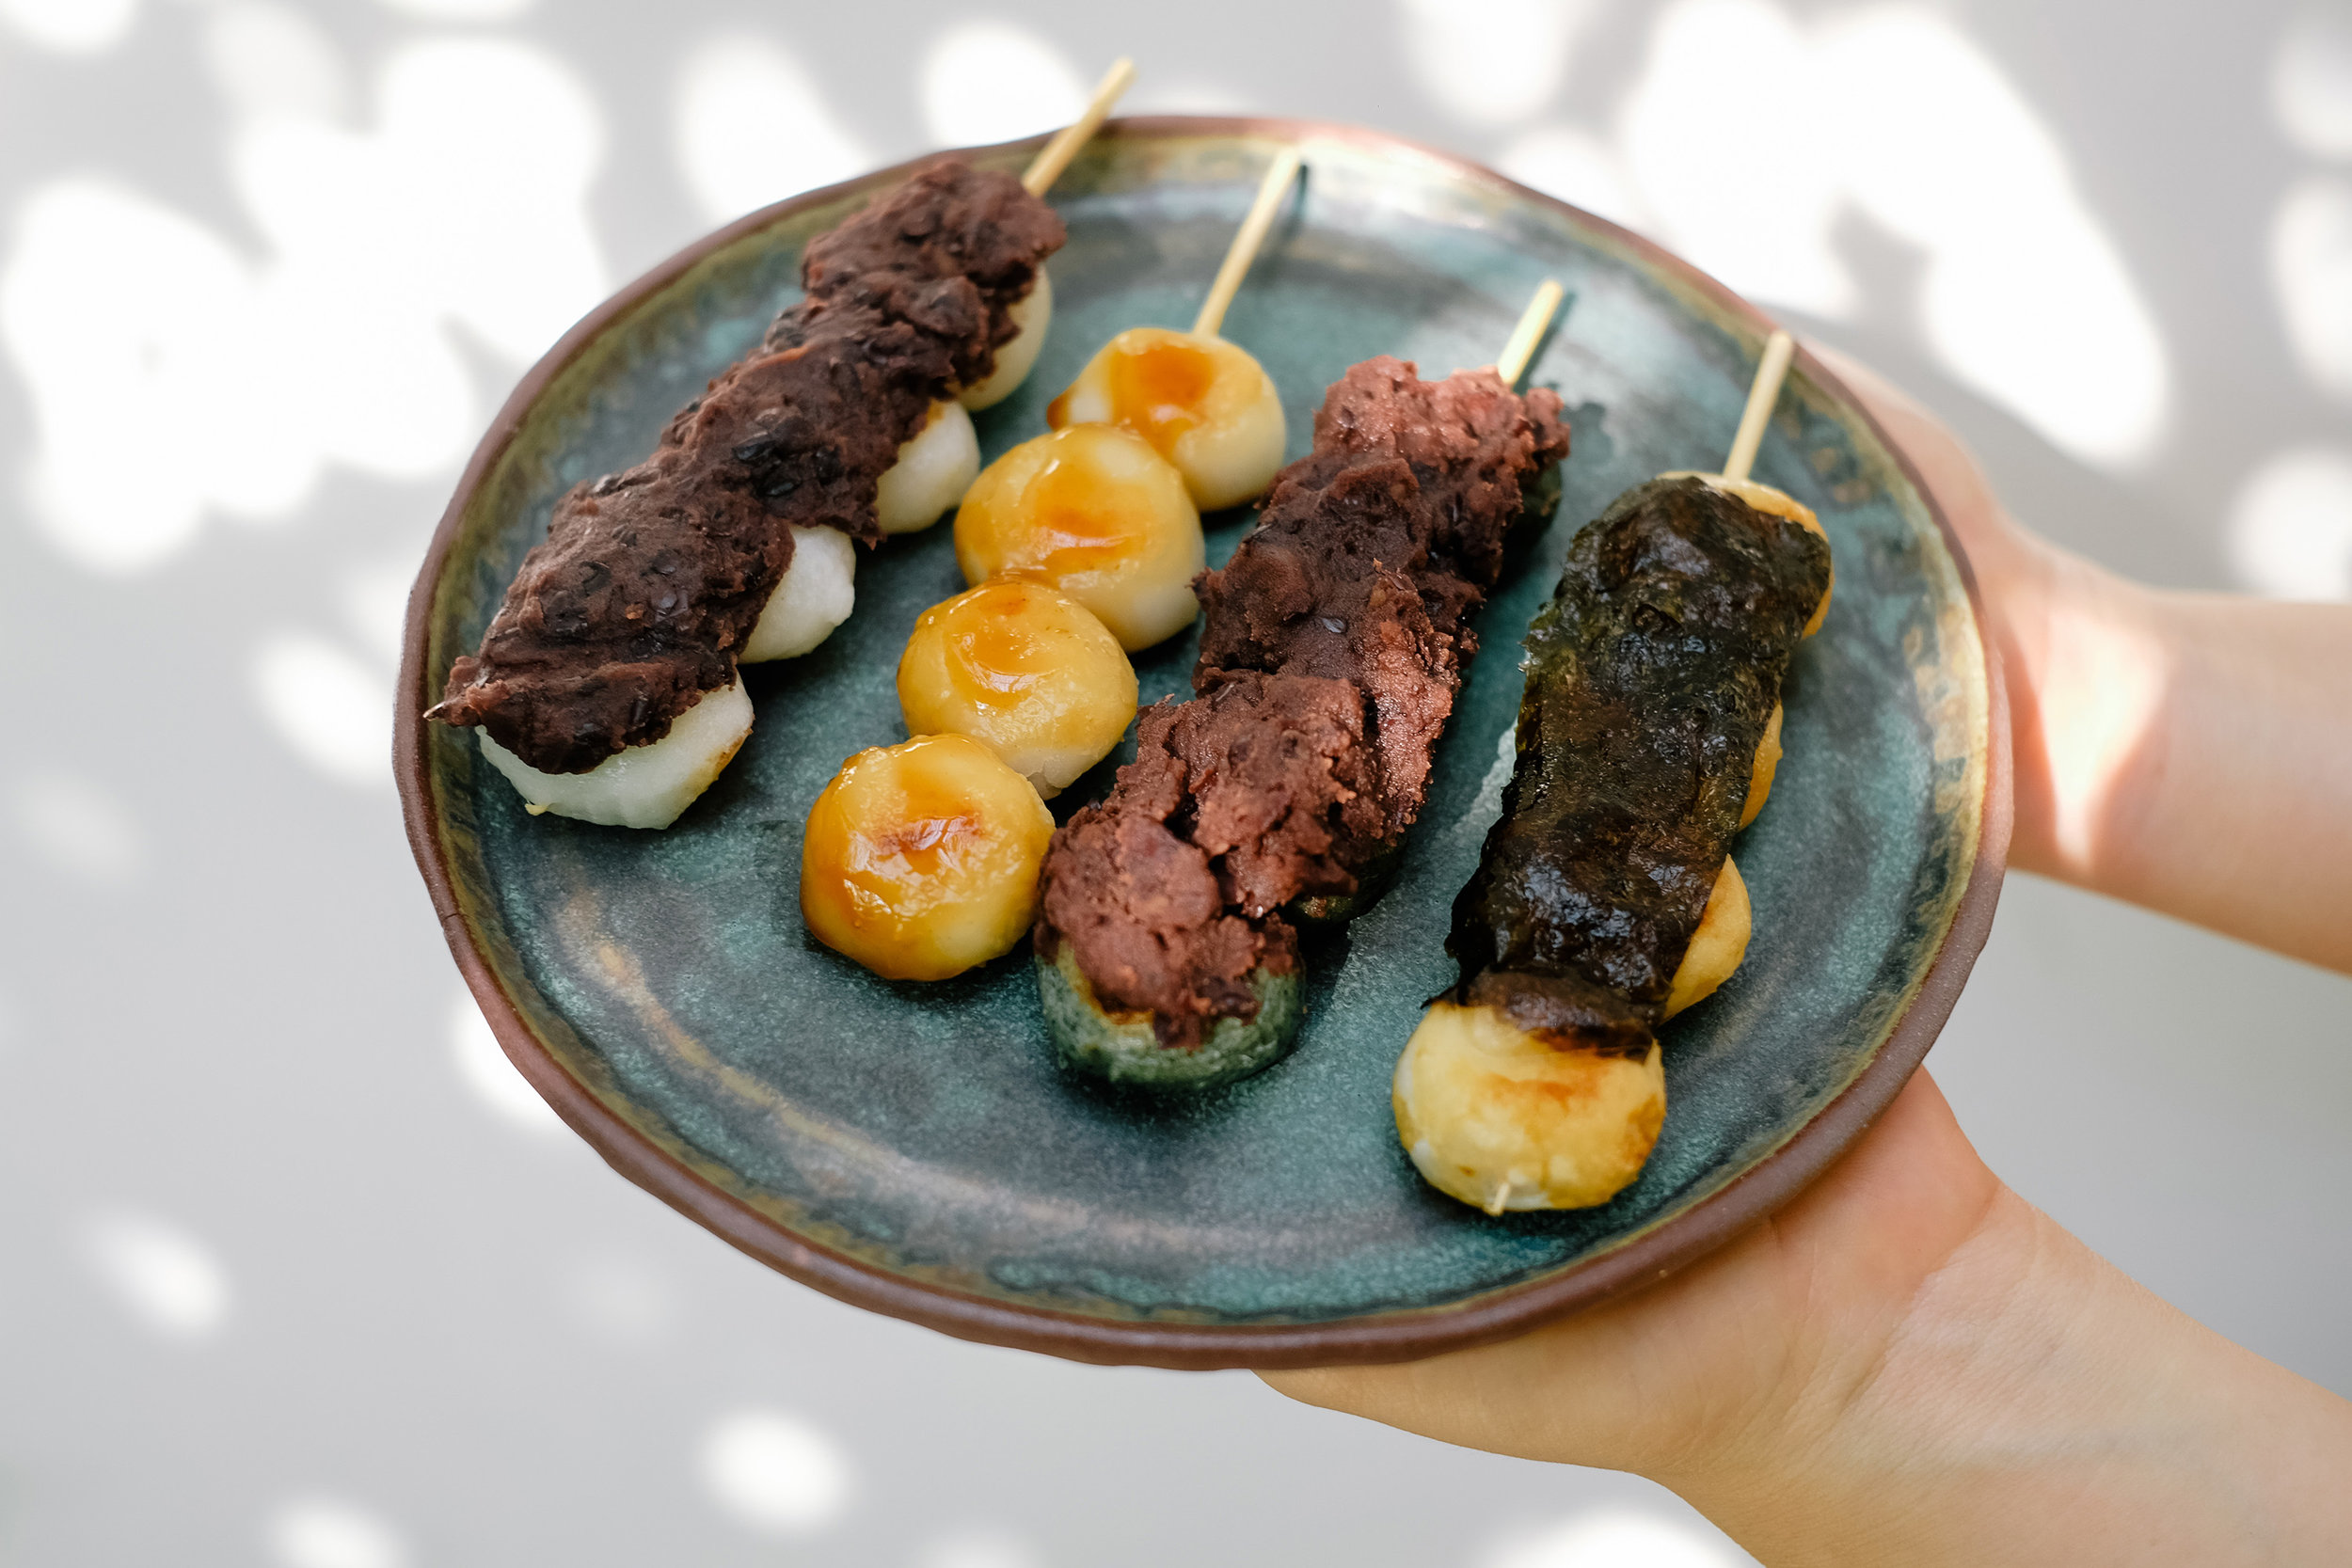 Anko (an) dango:  Red bean paste with mochi   Mitarashi dango:  Grilled mochi ball covered in a caramelized sweet soy sauce   Kusa dango (Yomogi dango):  Green spring dango made with Japanese mugwort (yomogi), sugar and red bean paste   Isobe Dango:  Mochi wrapped in seaweed